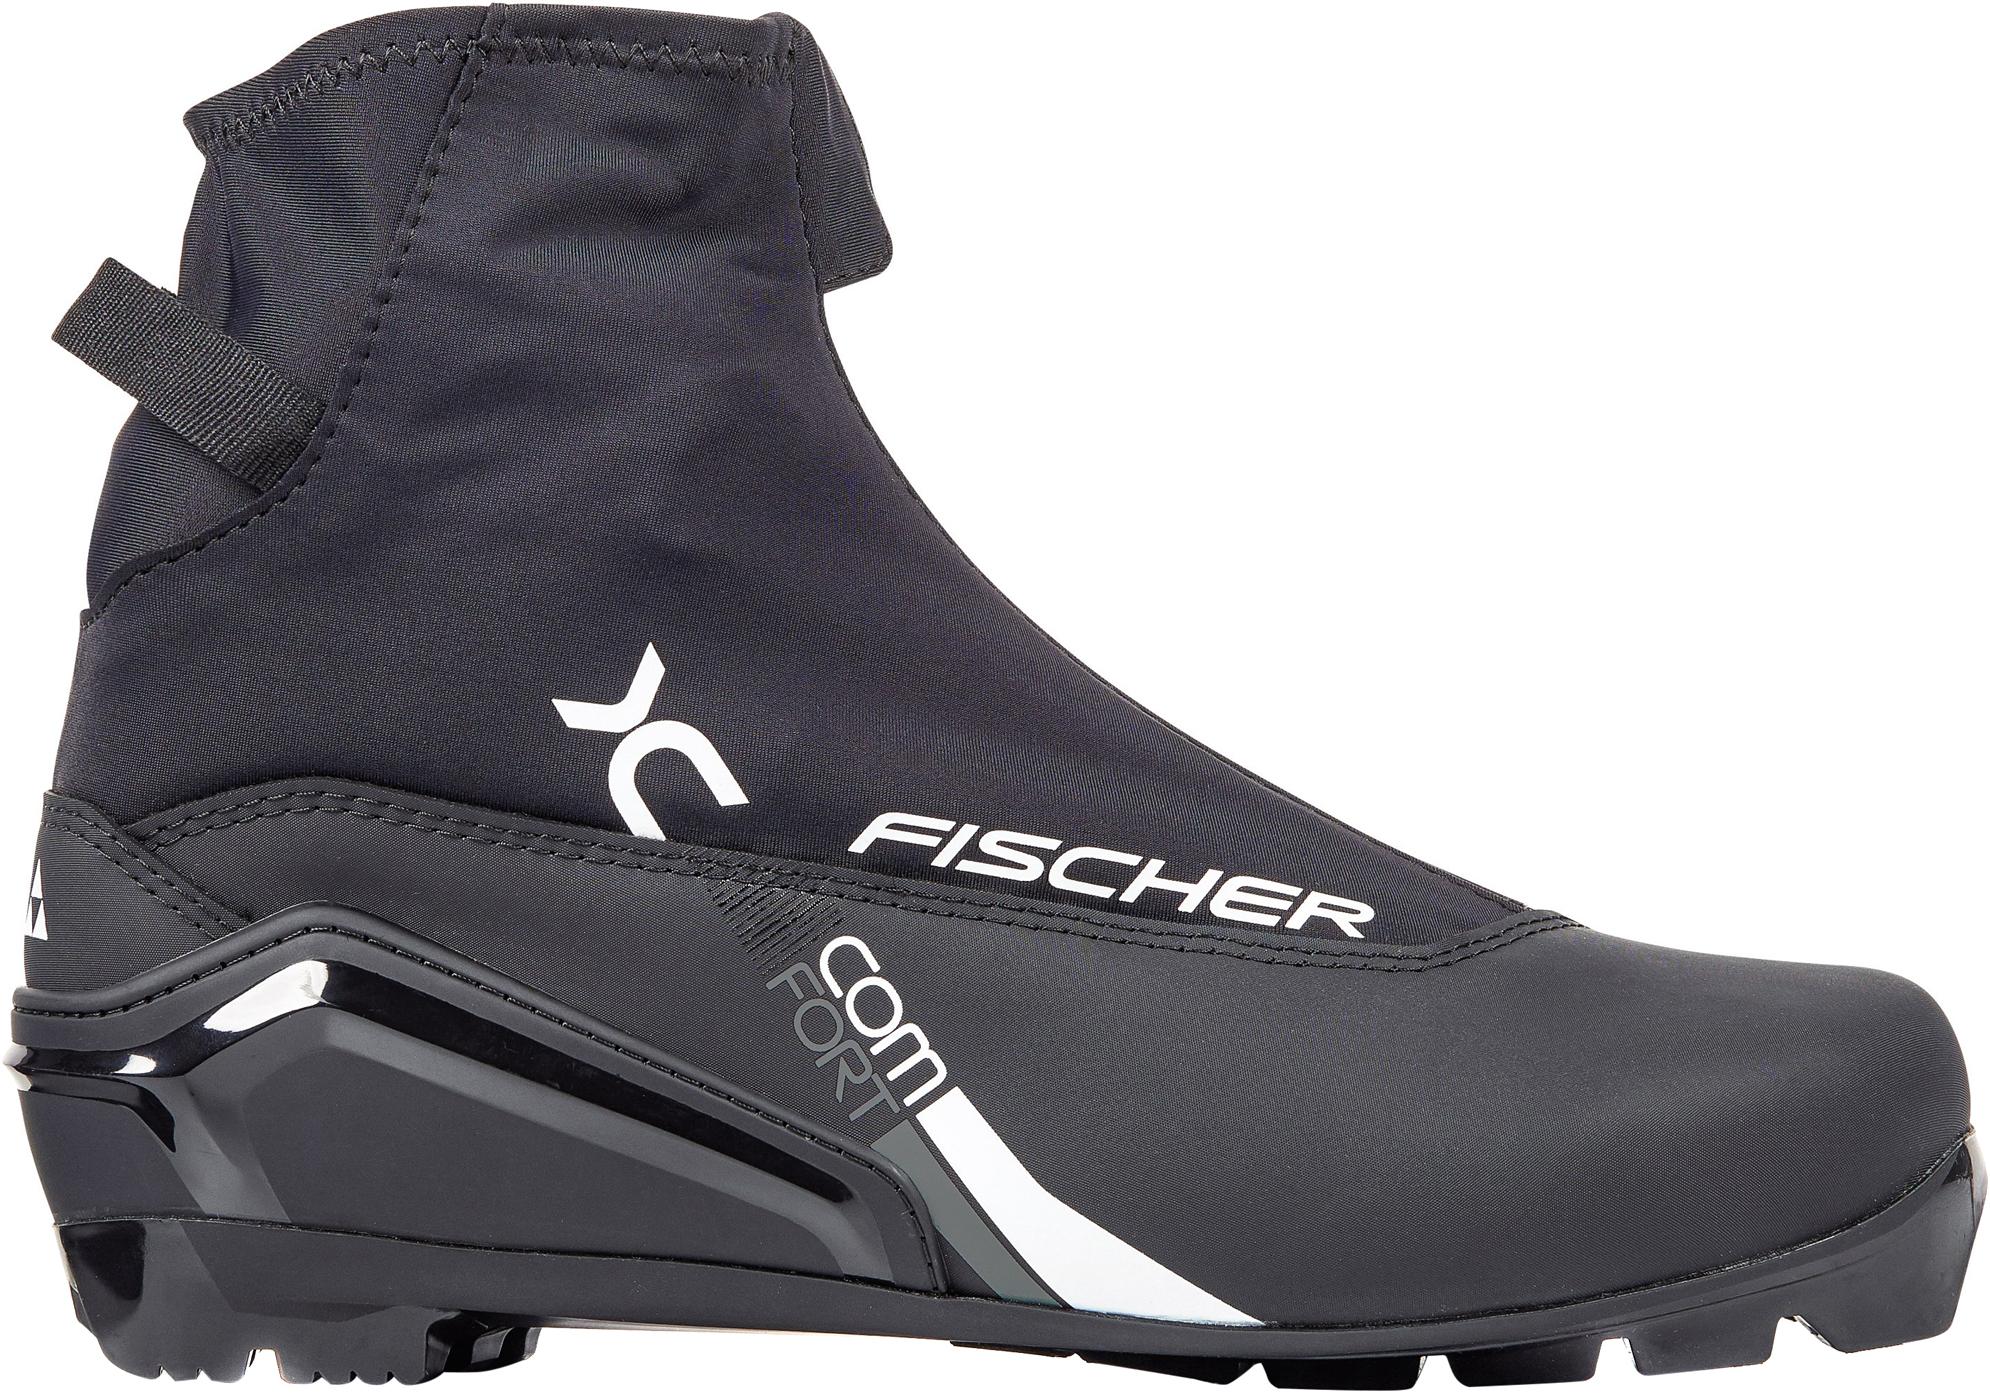 Fischer Ботинки для беговых лыж Xc Comfort Silver